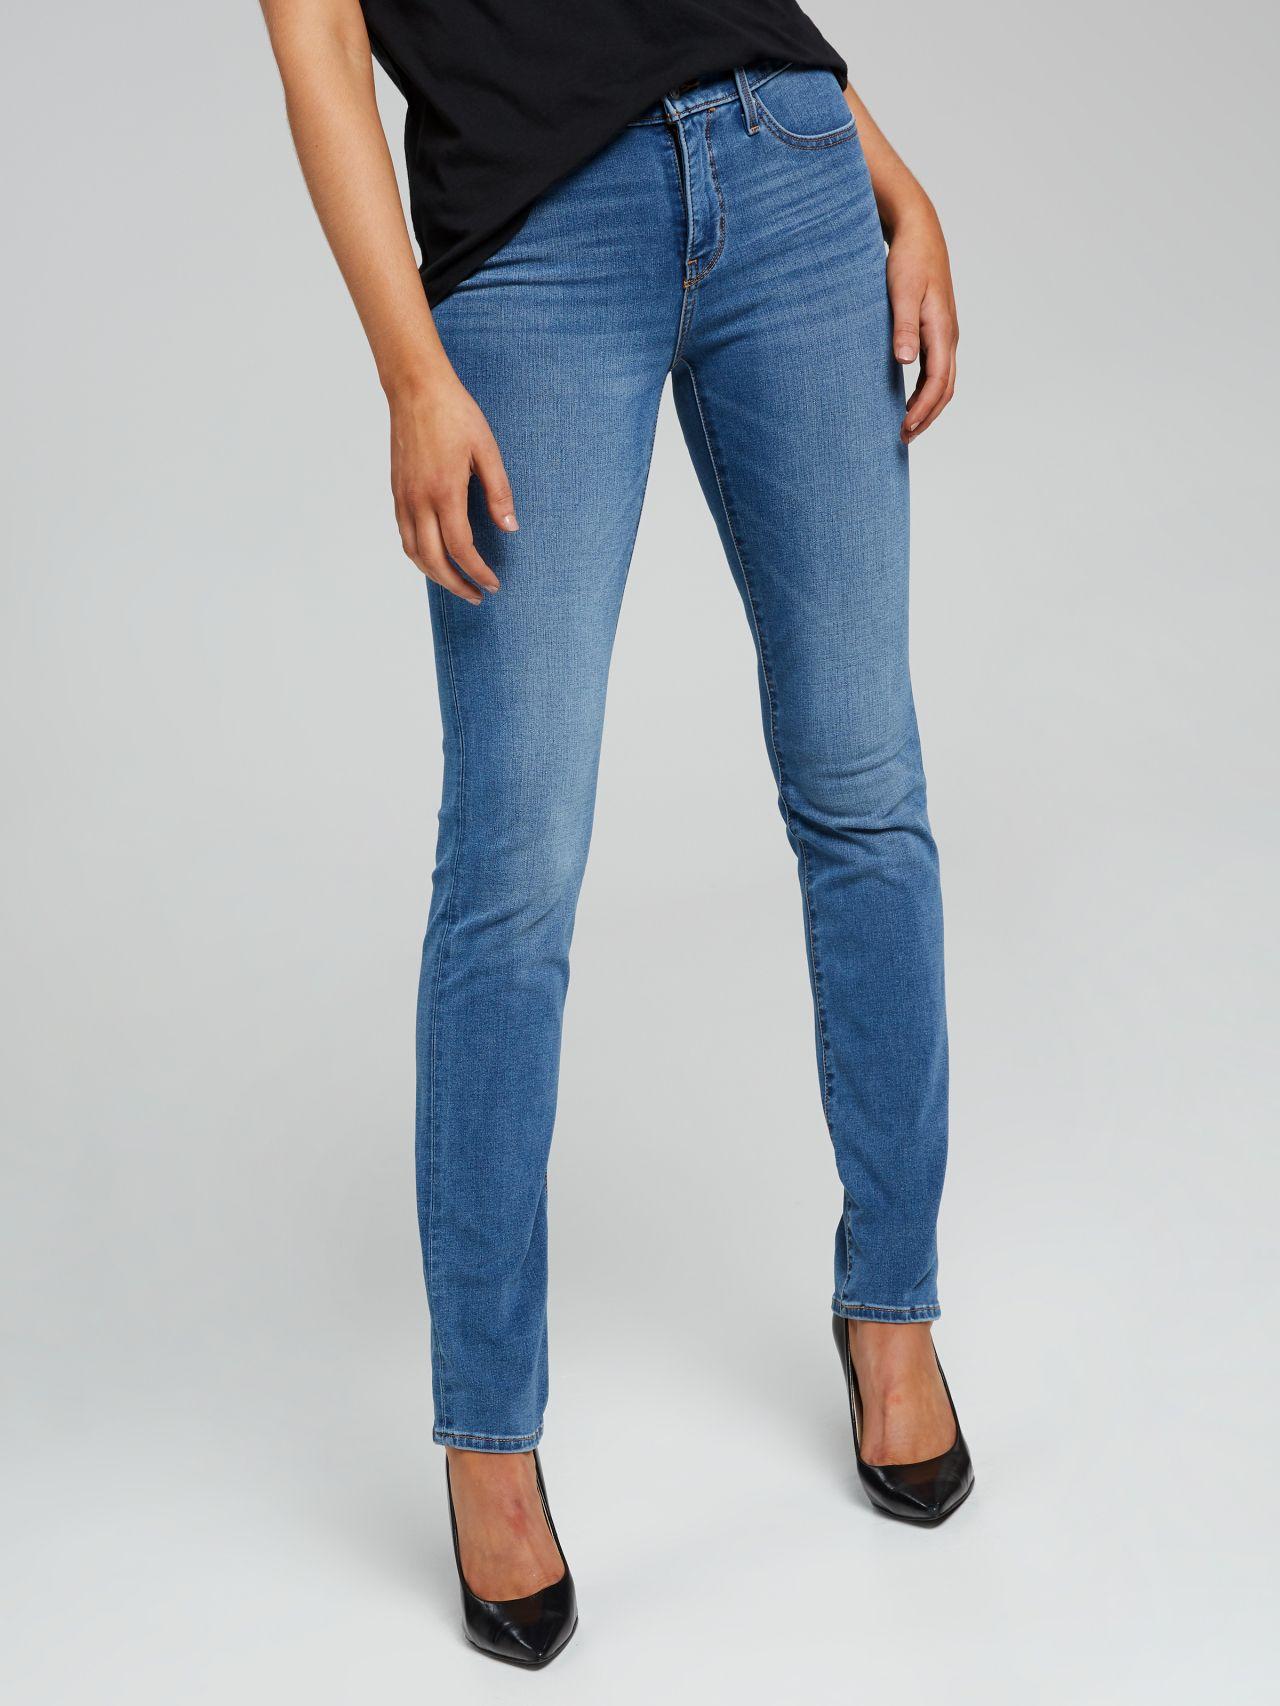 Levi's 312 Shaping Slim Jean In Turn Back Time Denim Just